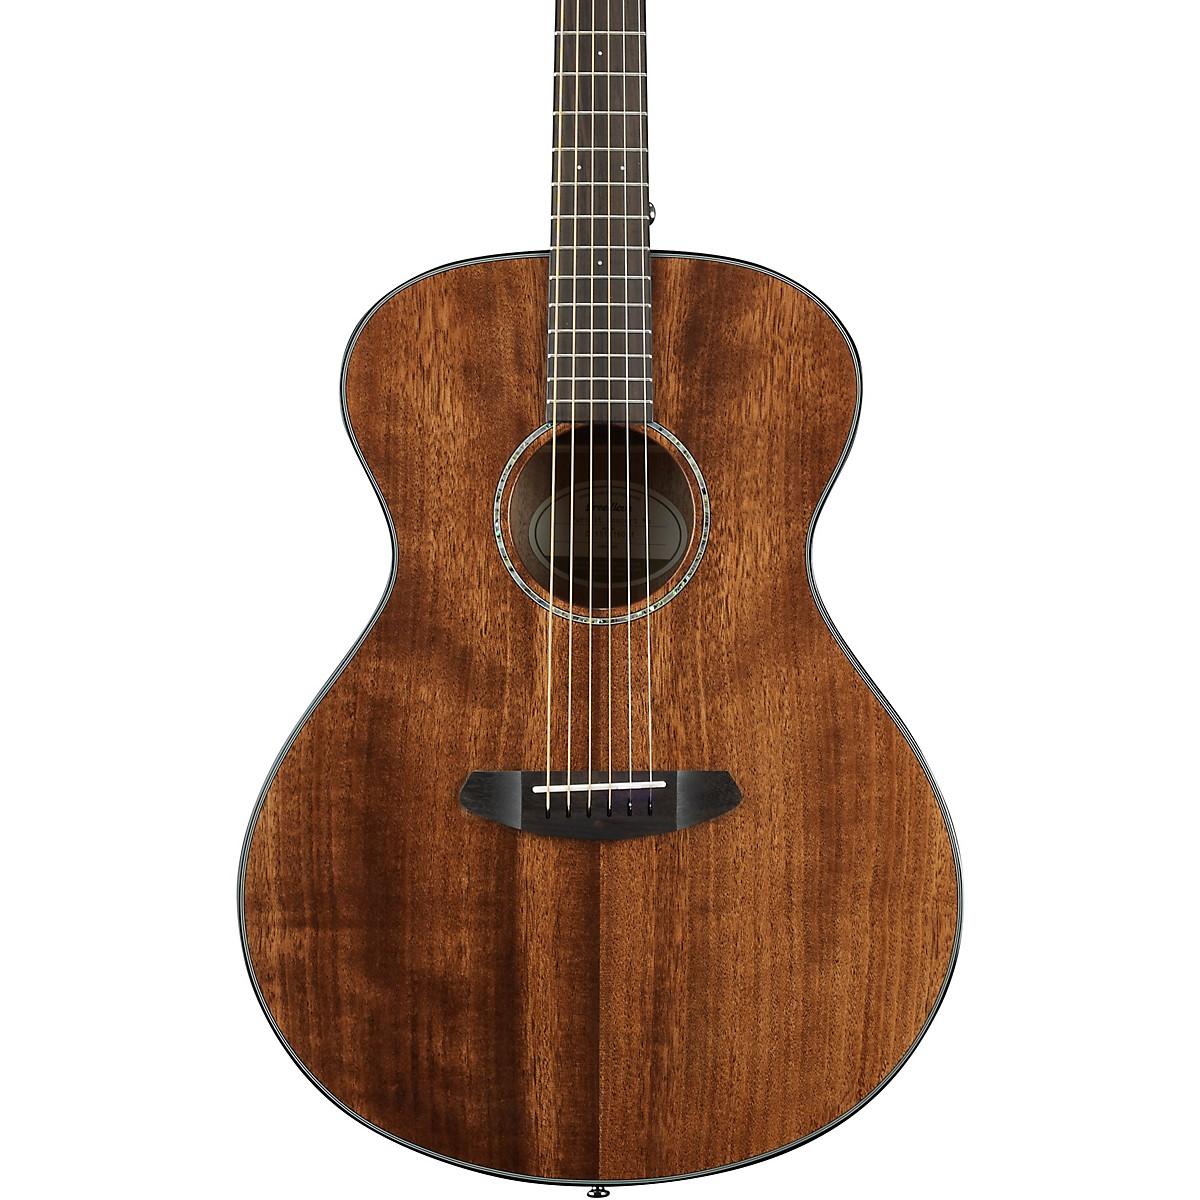 Breedlove Pursuit Concert All Mahogany Acoustic-Electric Guitar